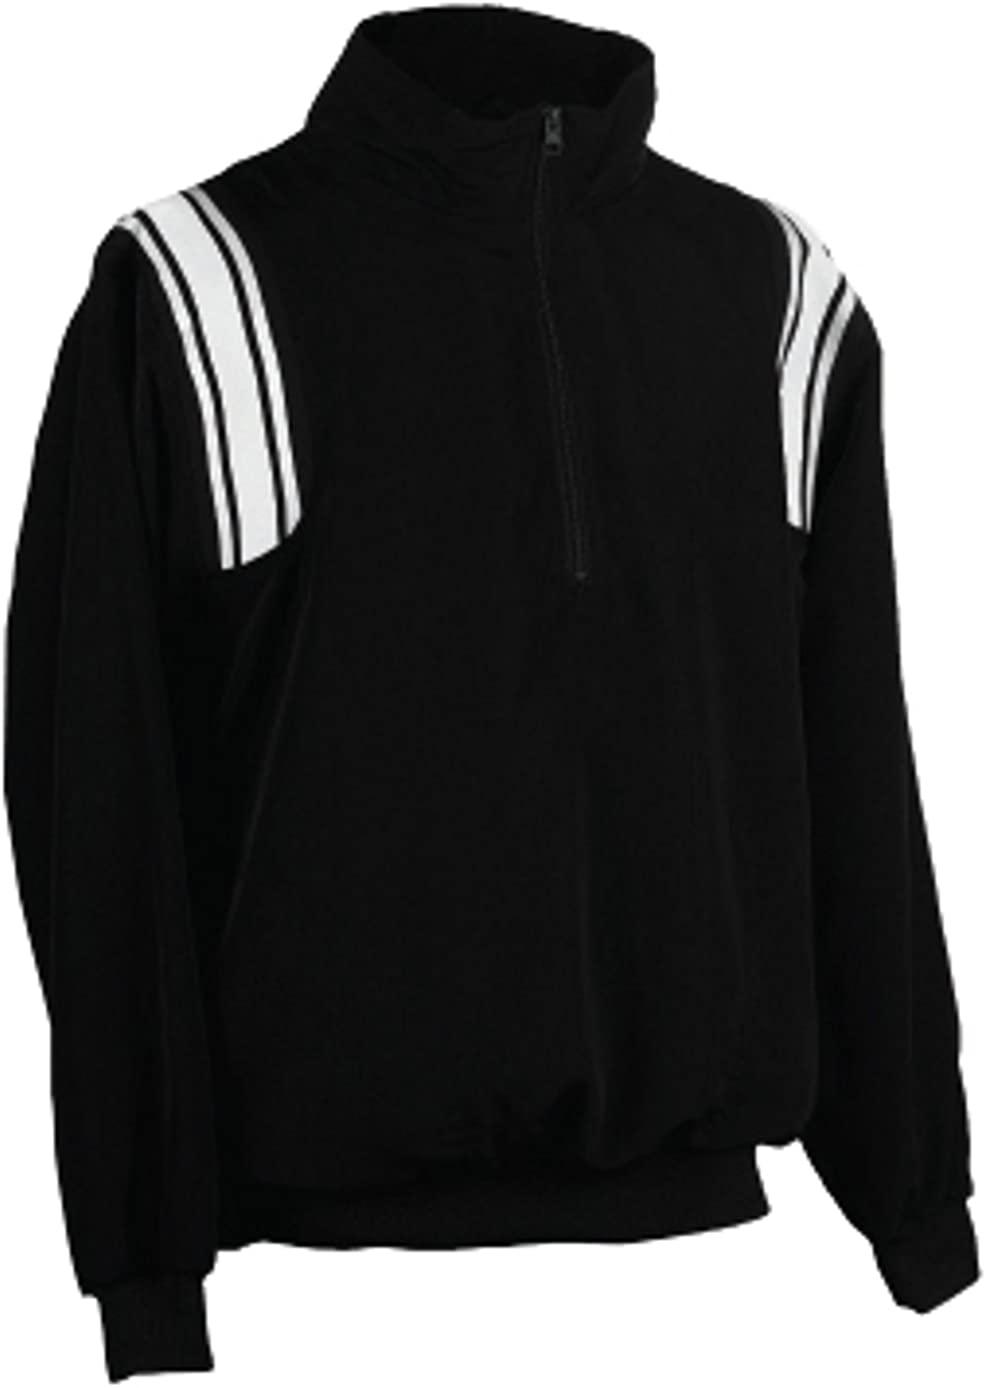 Smitty Black and White Umpire Jacket